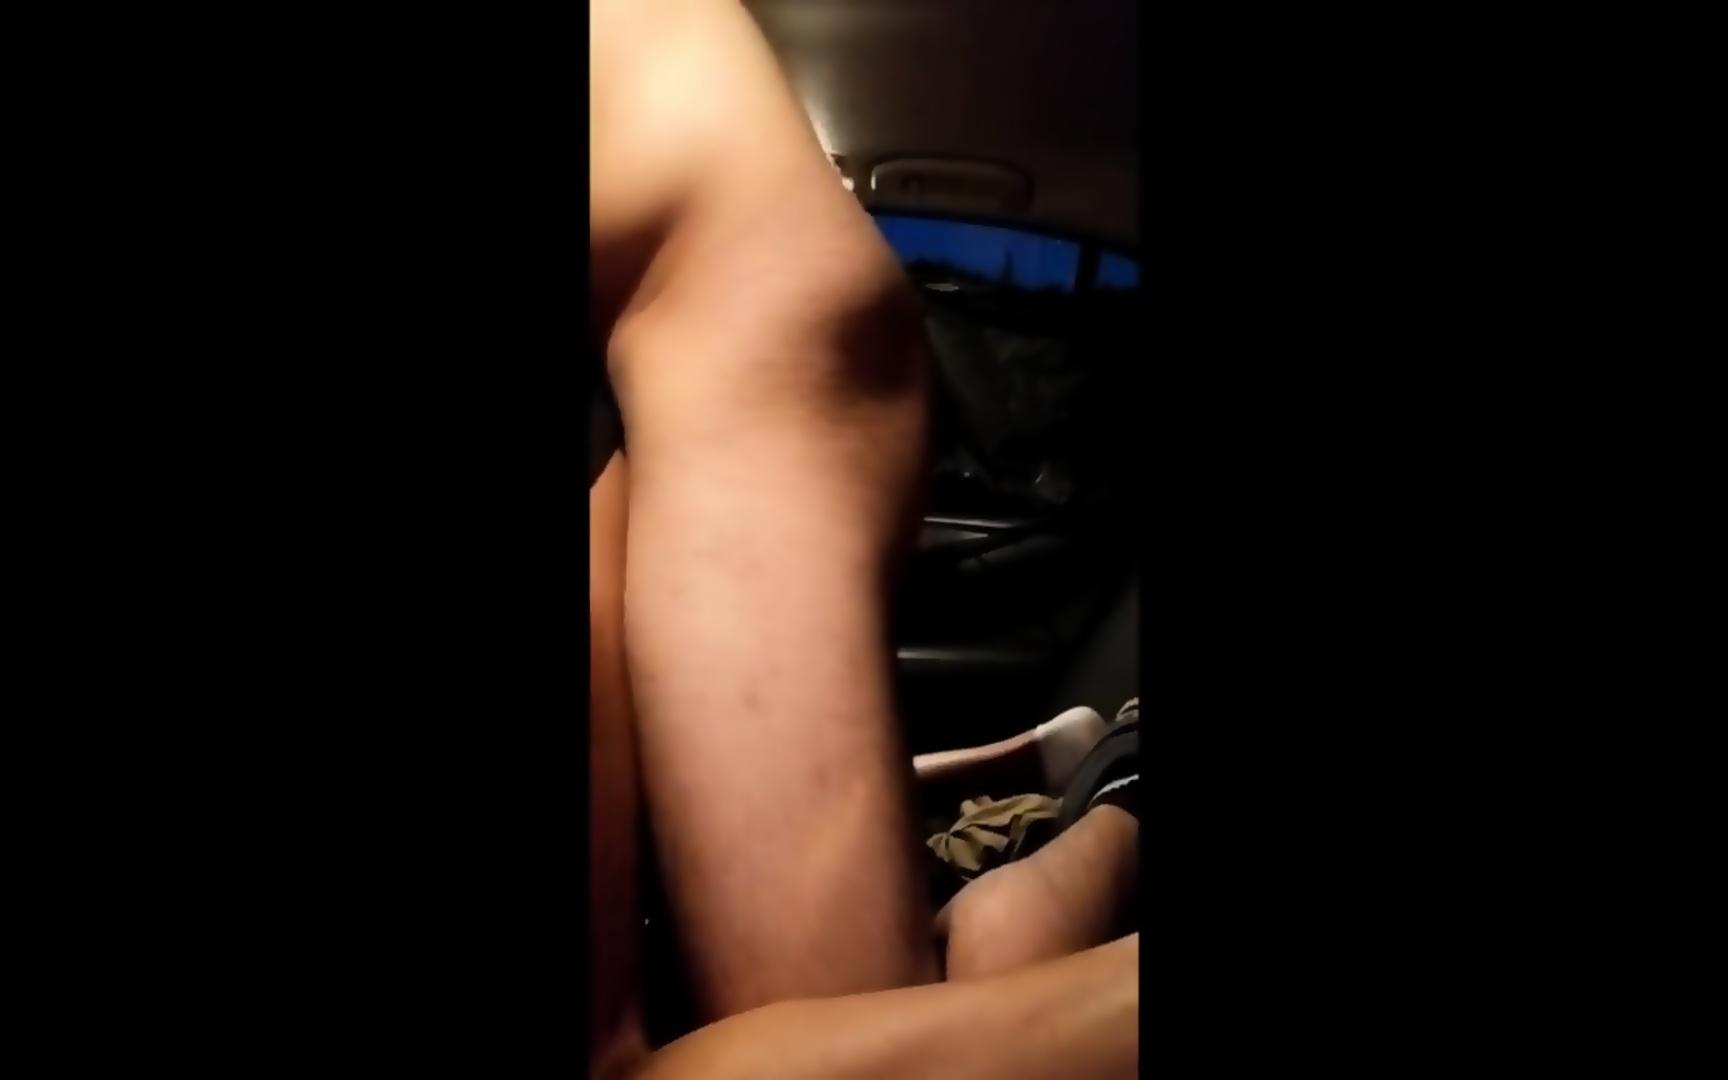 Fitness Model Tinder Date